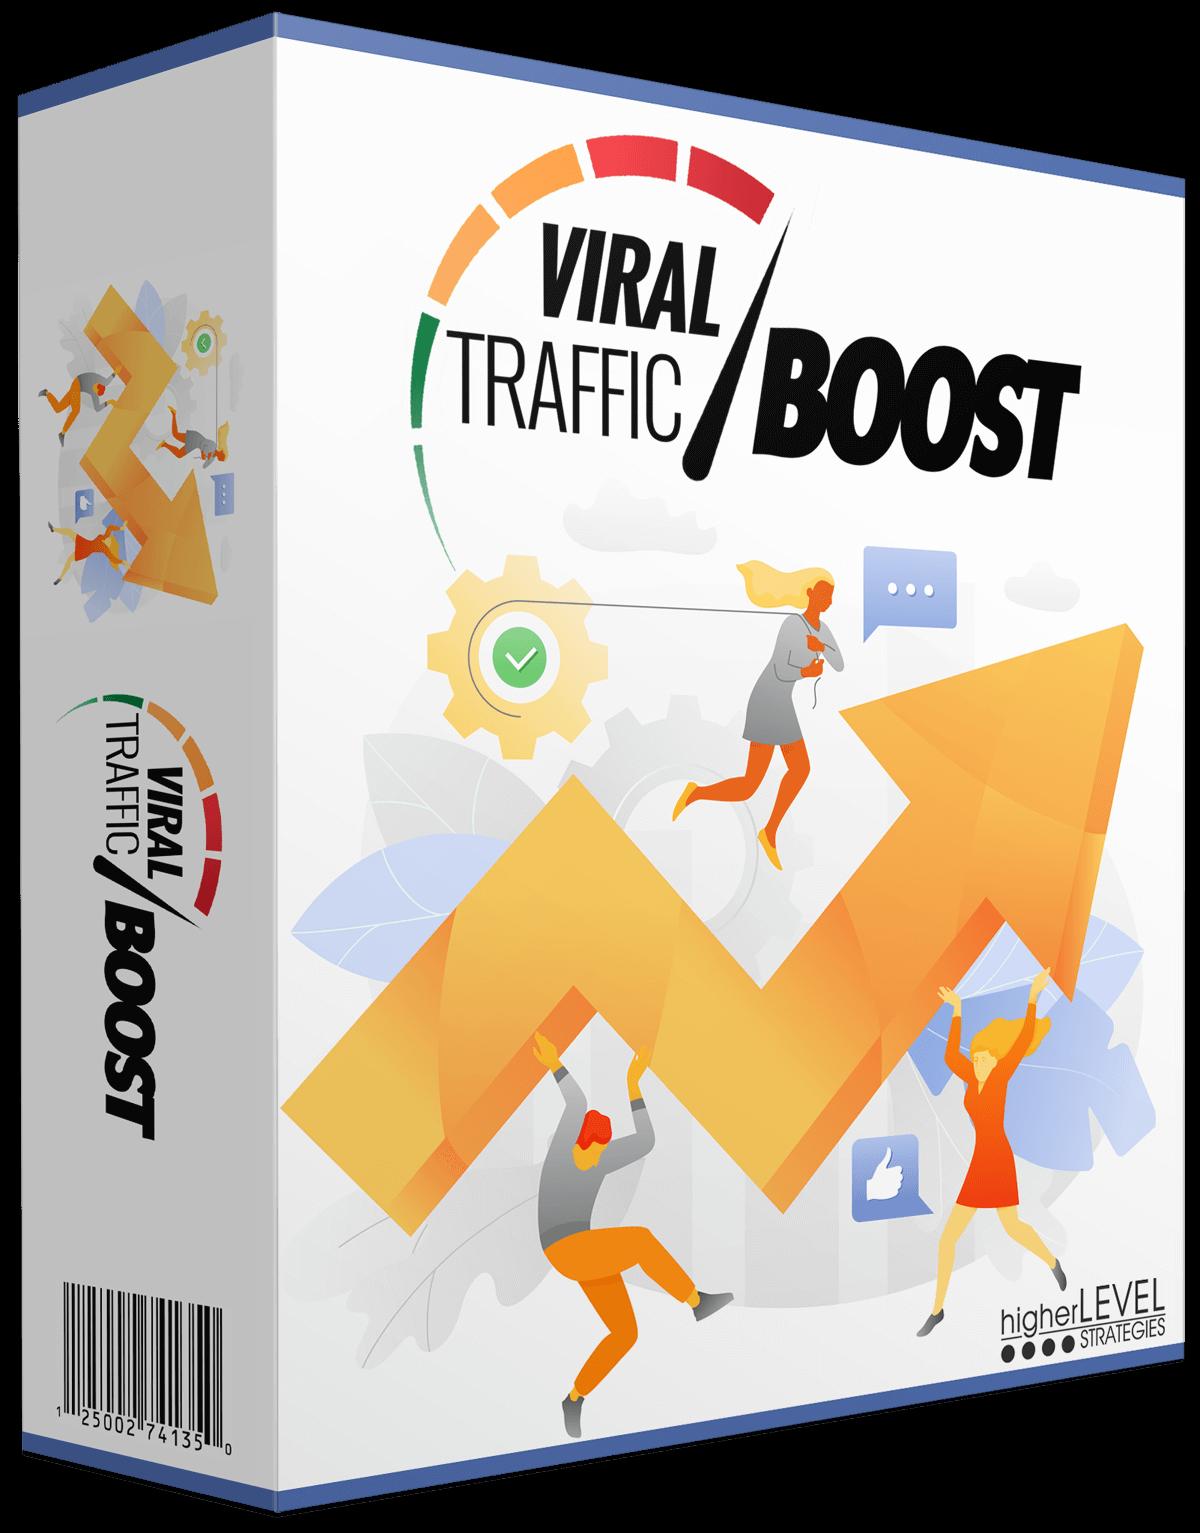 Viral-Traffic-Boost-Logo